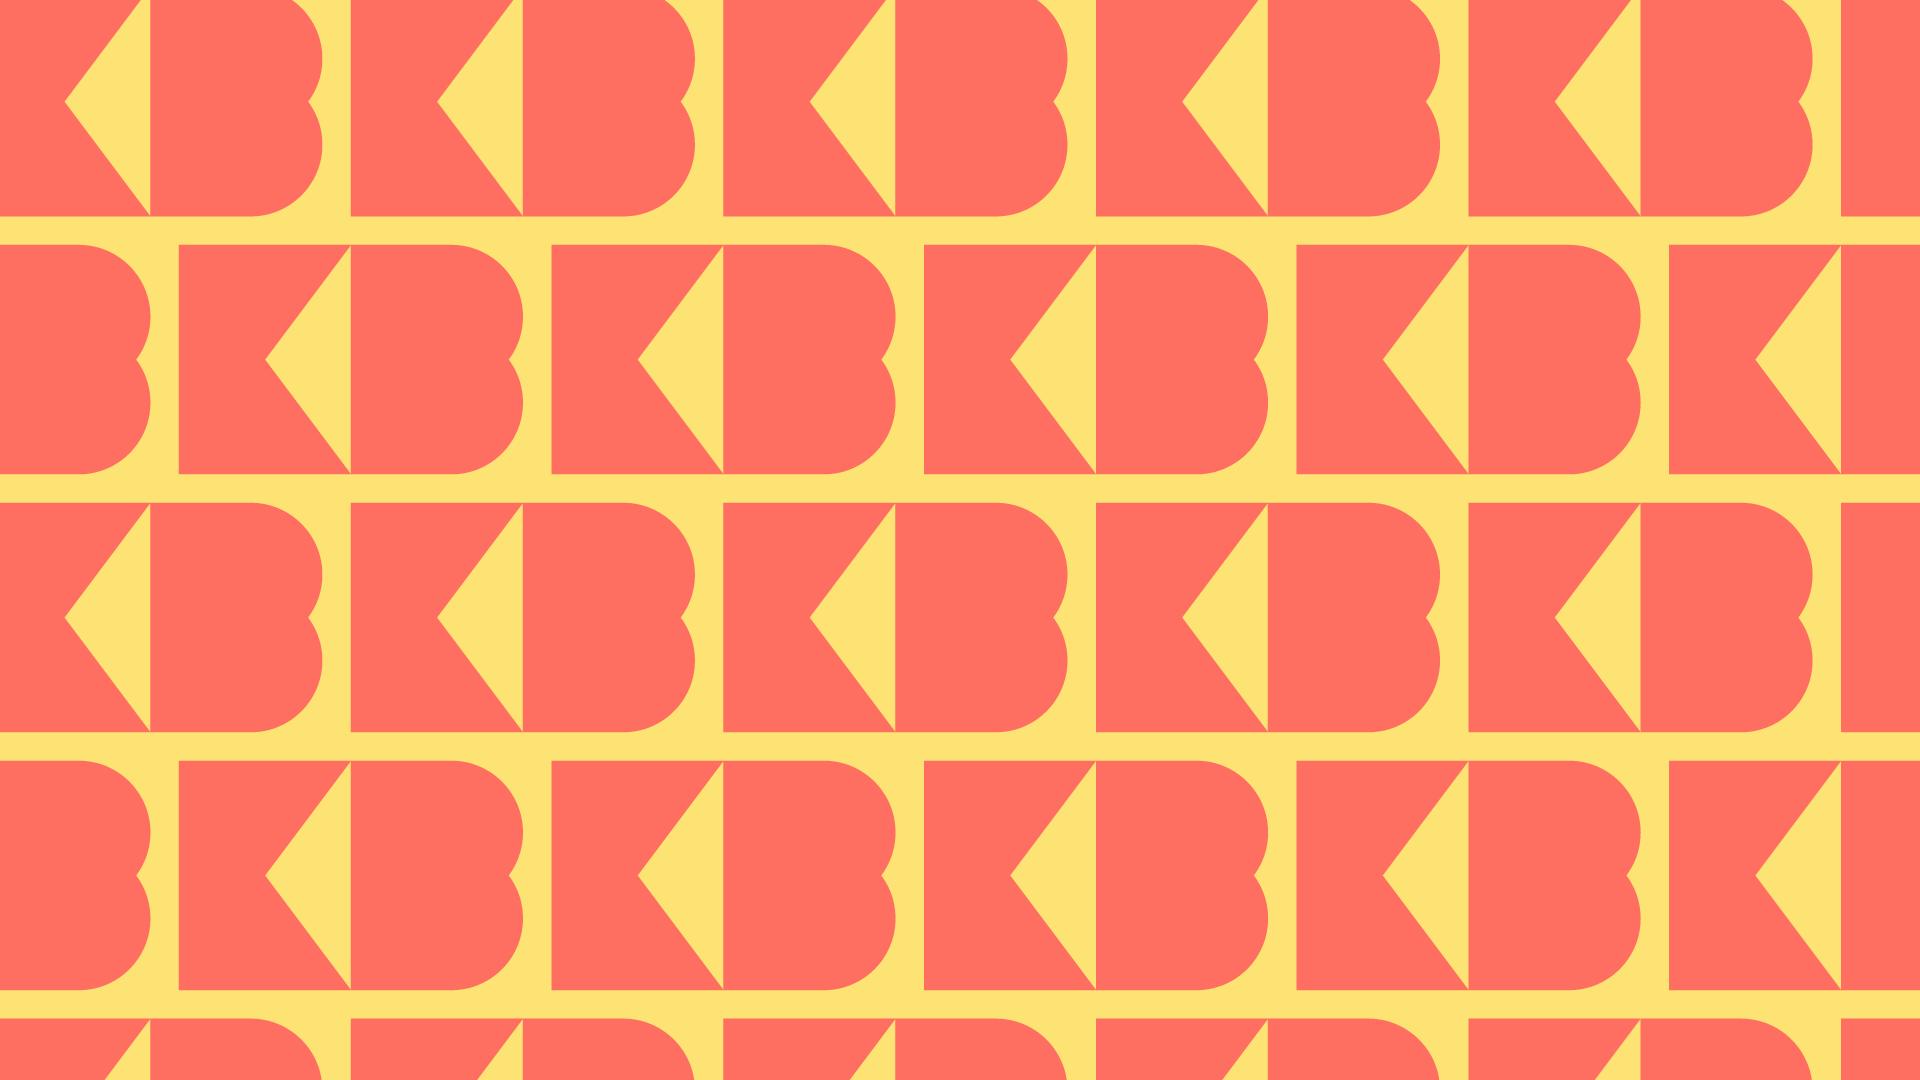 KB pattern